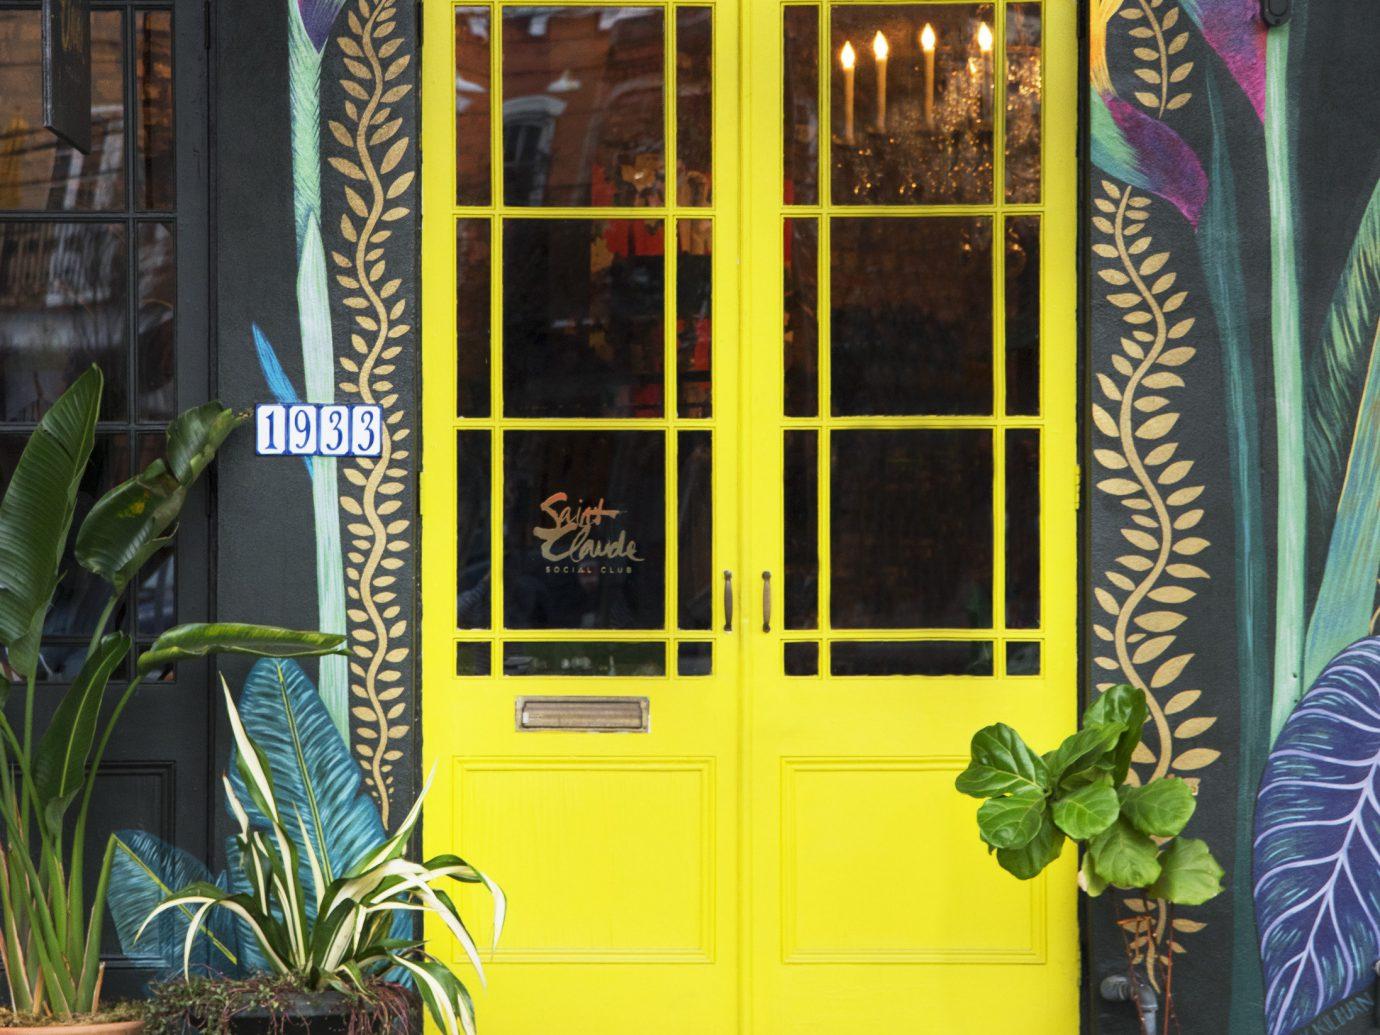 Girls Getaways New Orleans Trip Ideas Weekend Getaways yellow door window house facade plant